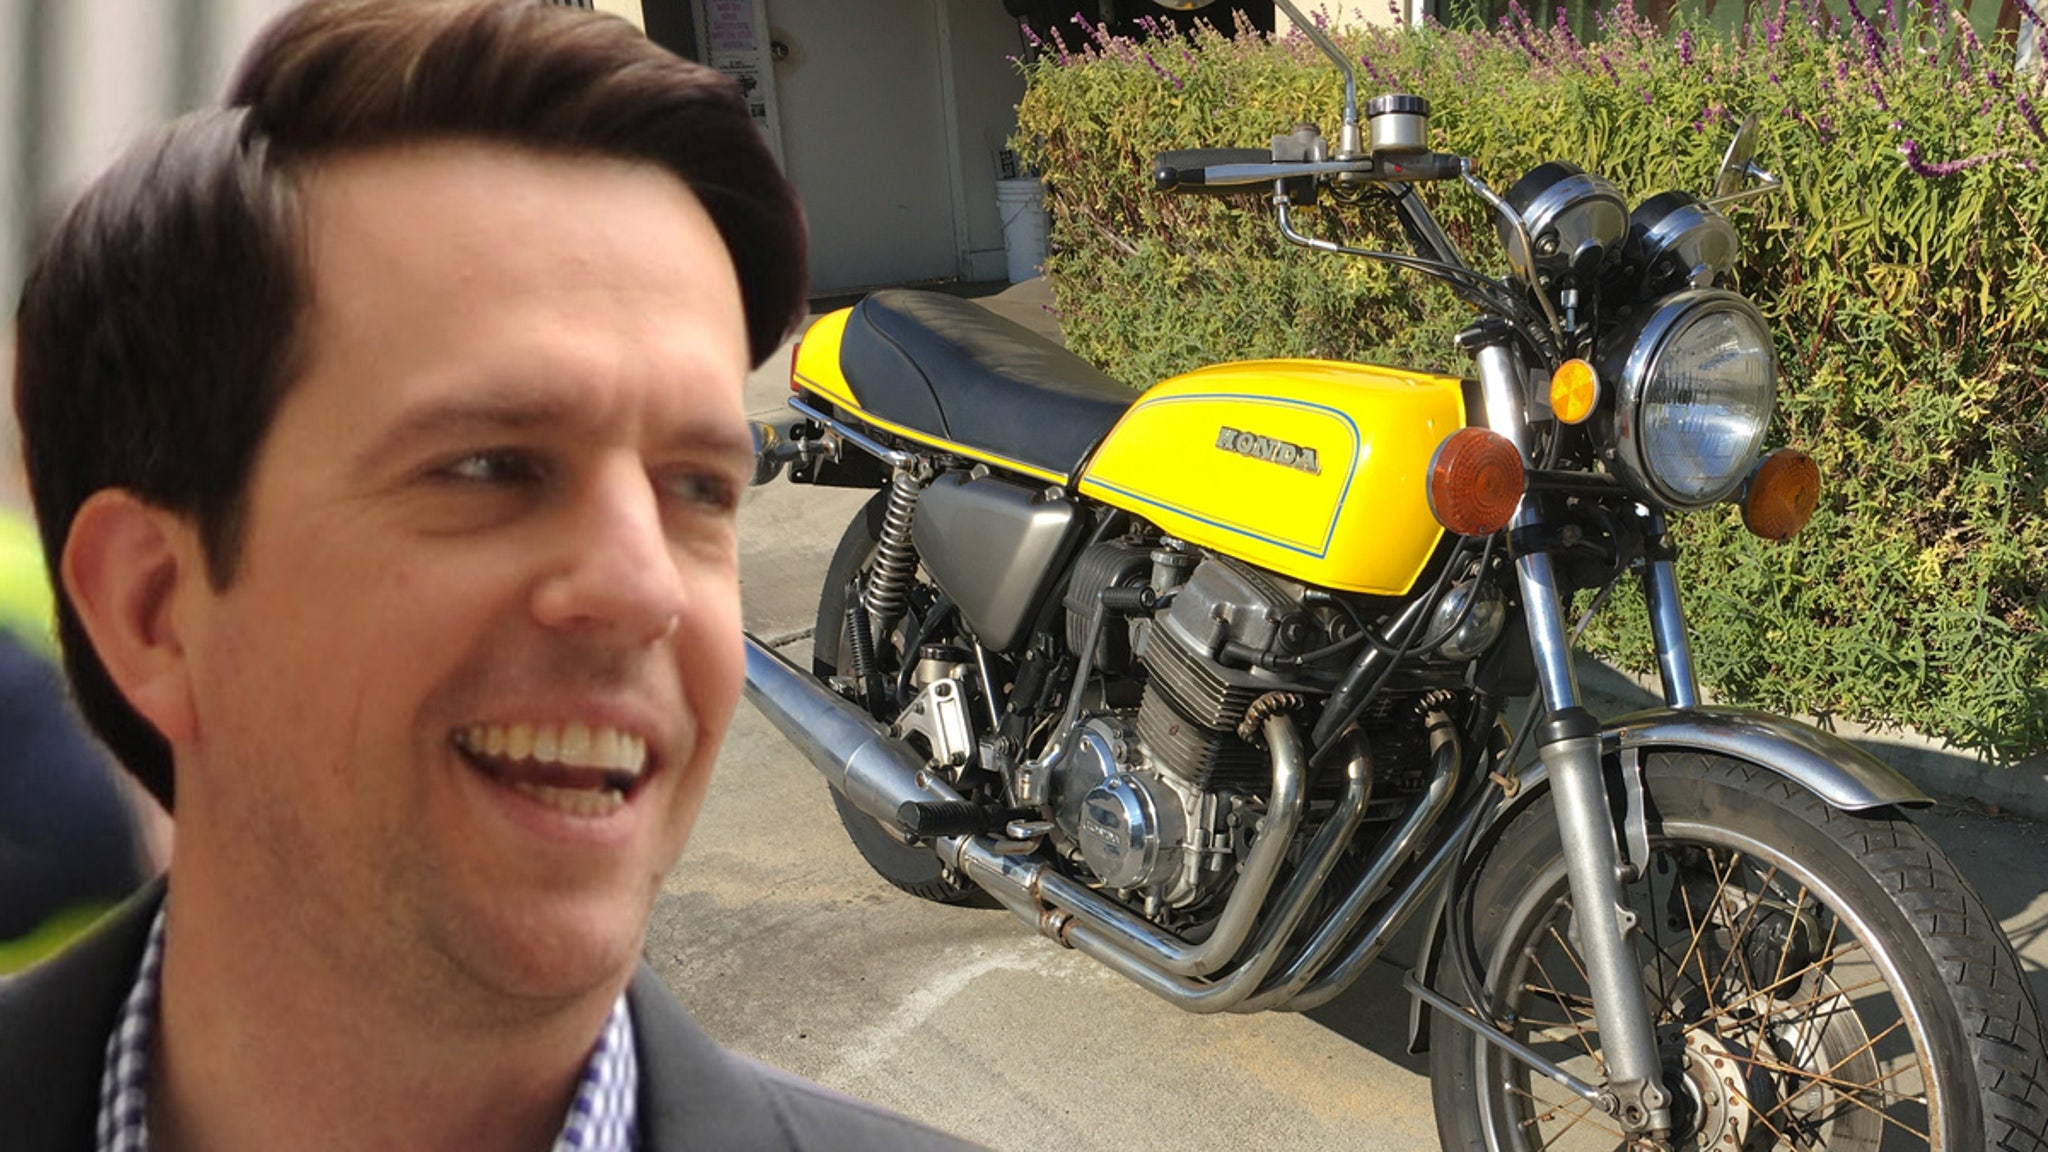 Эд Хелмс разгружает мотоцикл Honda, на котором он ехал на пробы